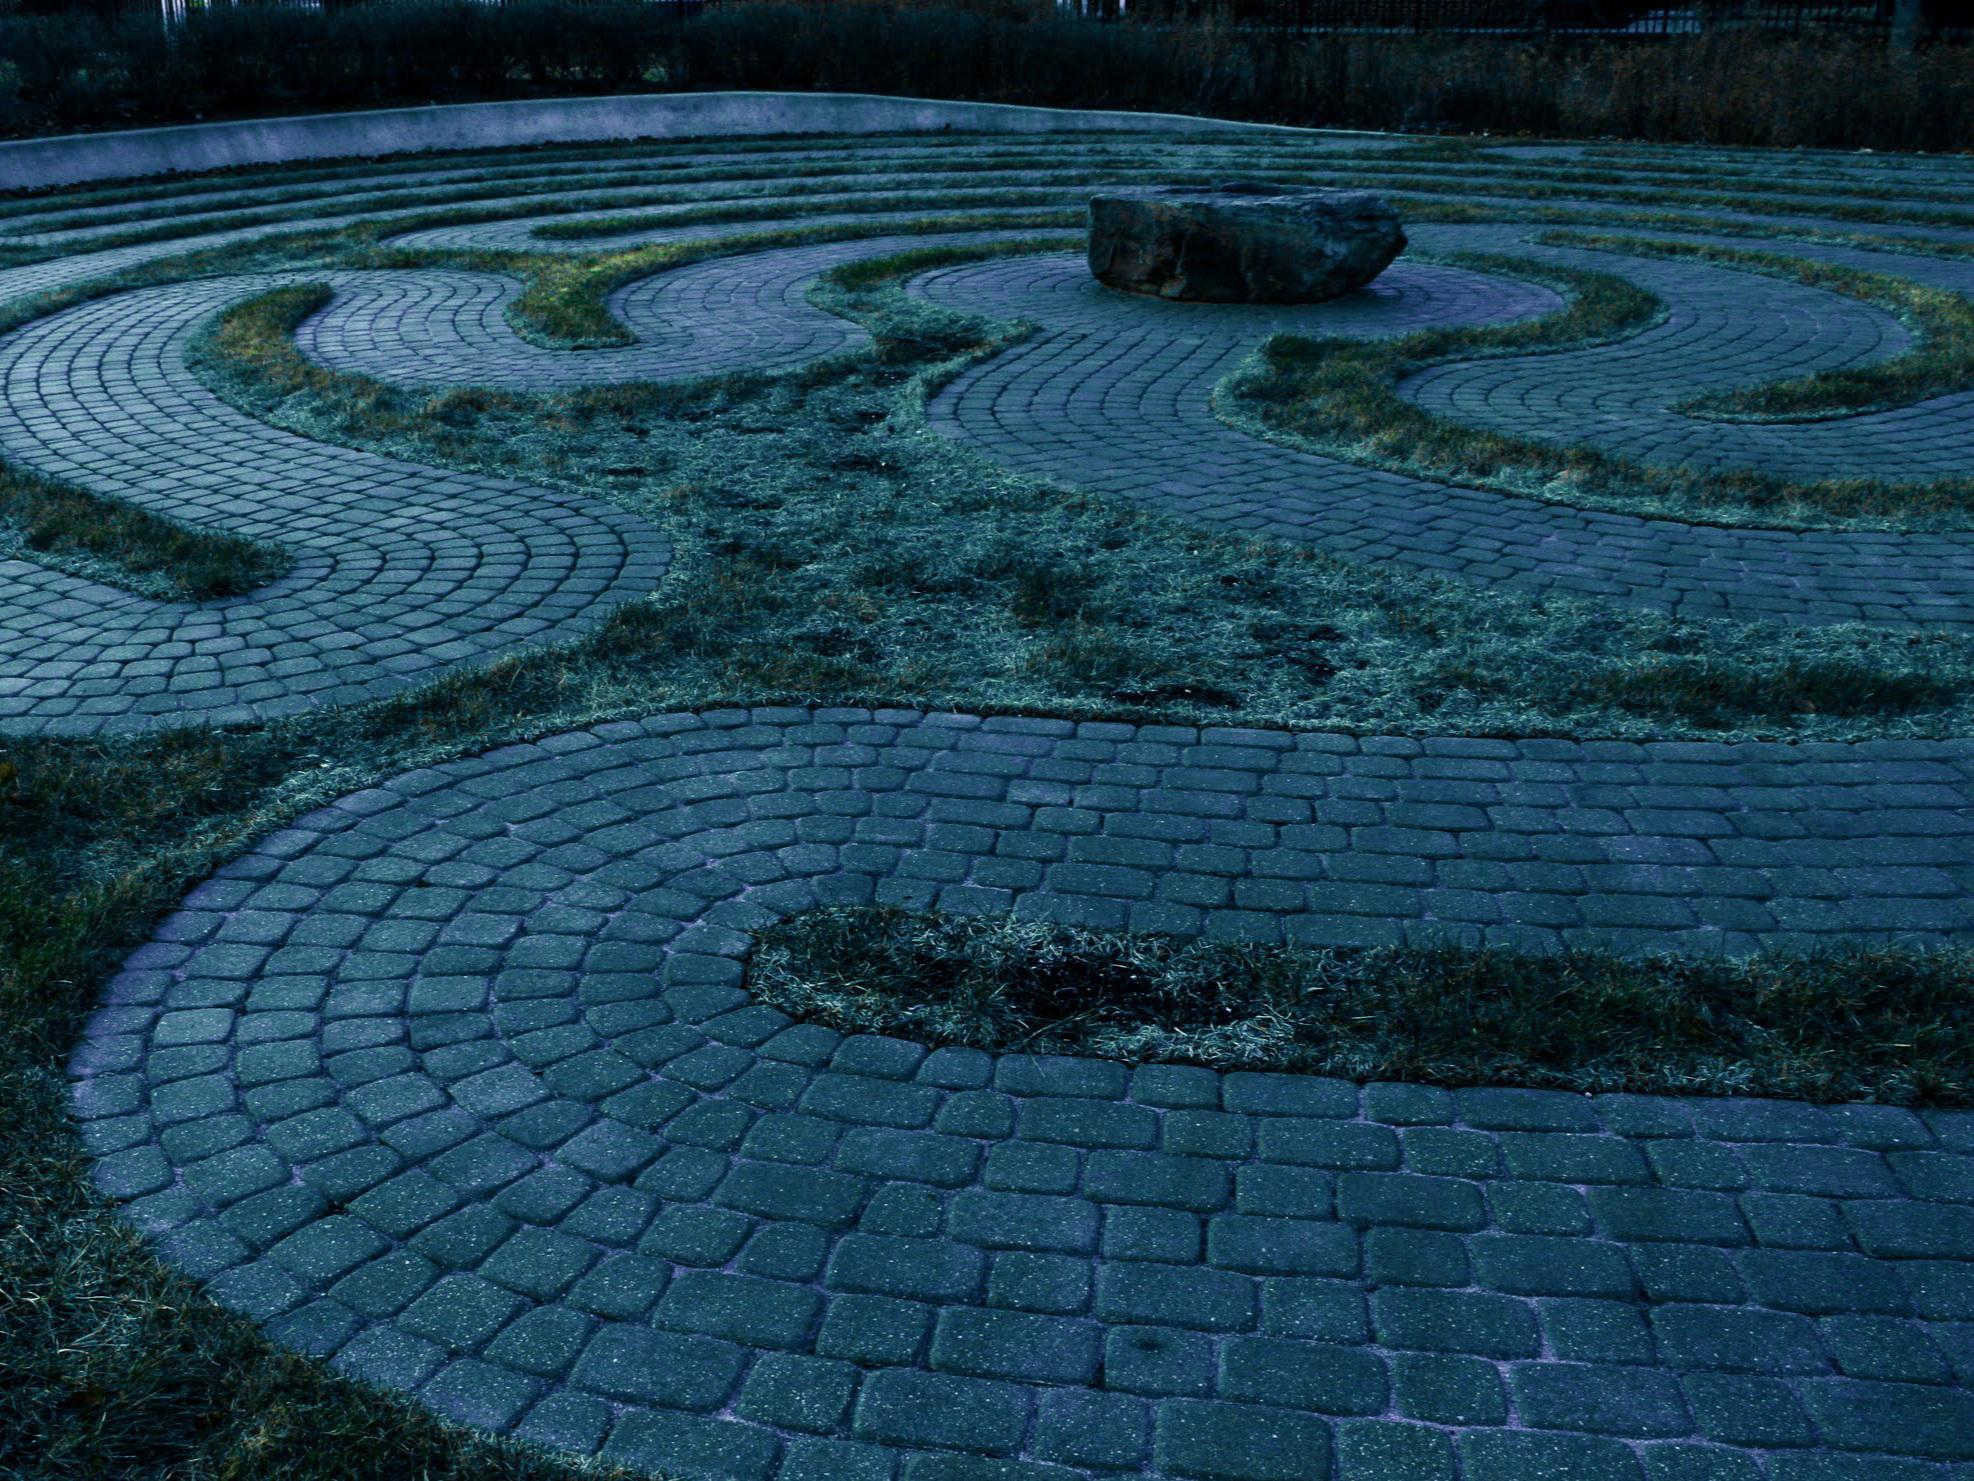 Community Prayer Labyrinth. Lake Zurich, IL, 2018.